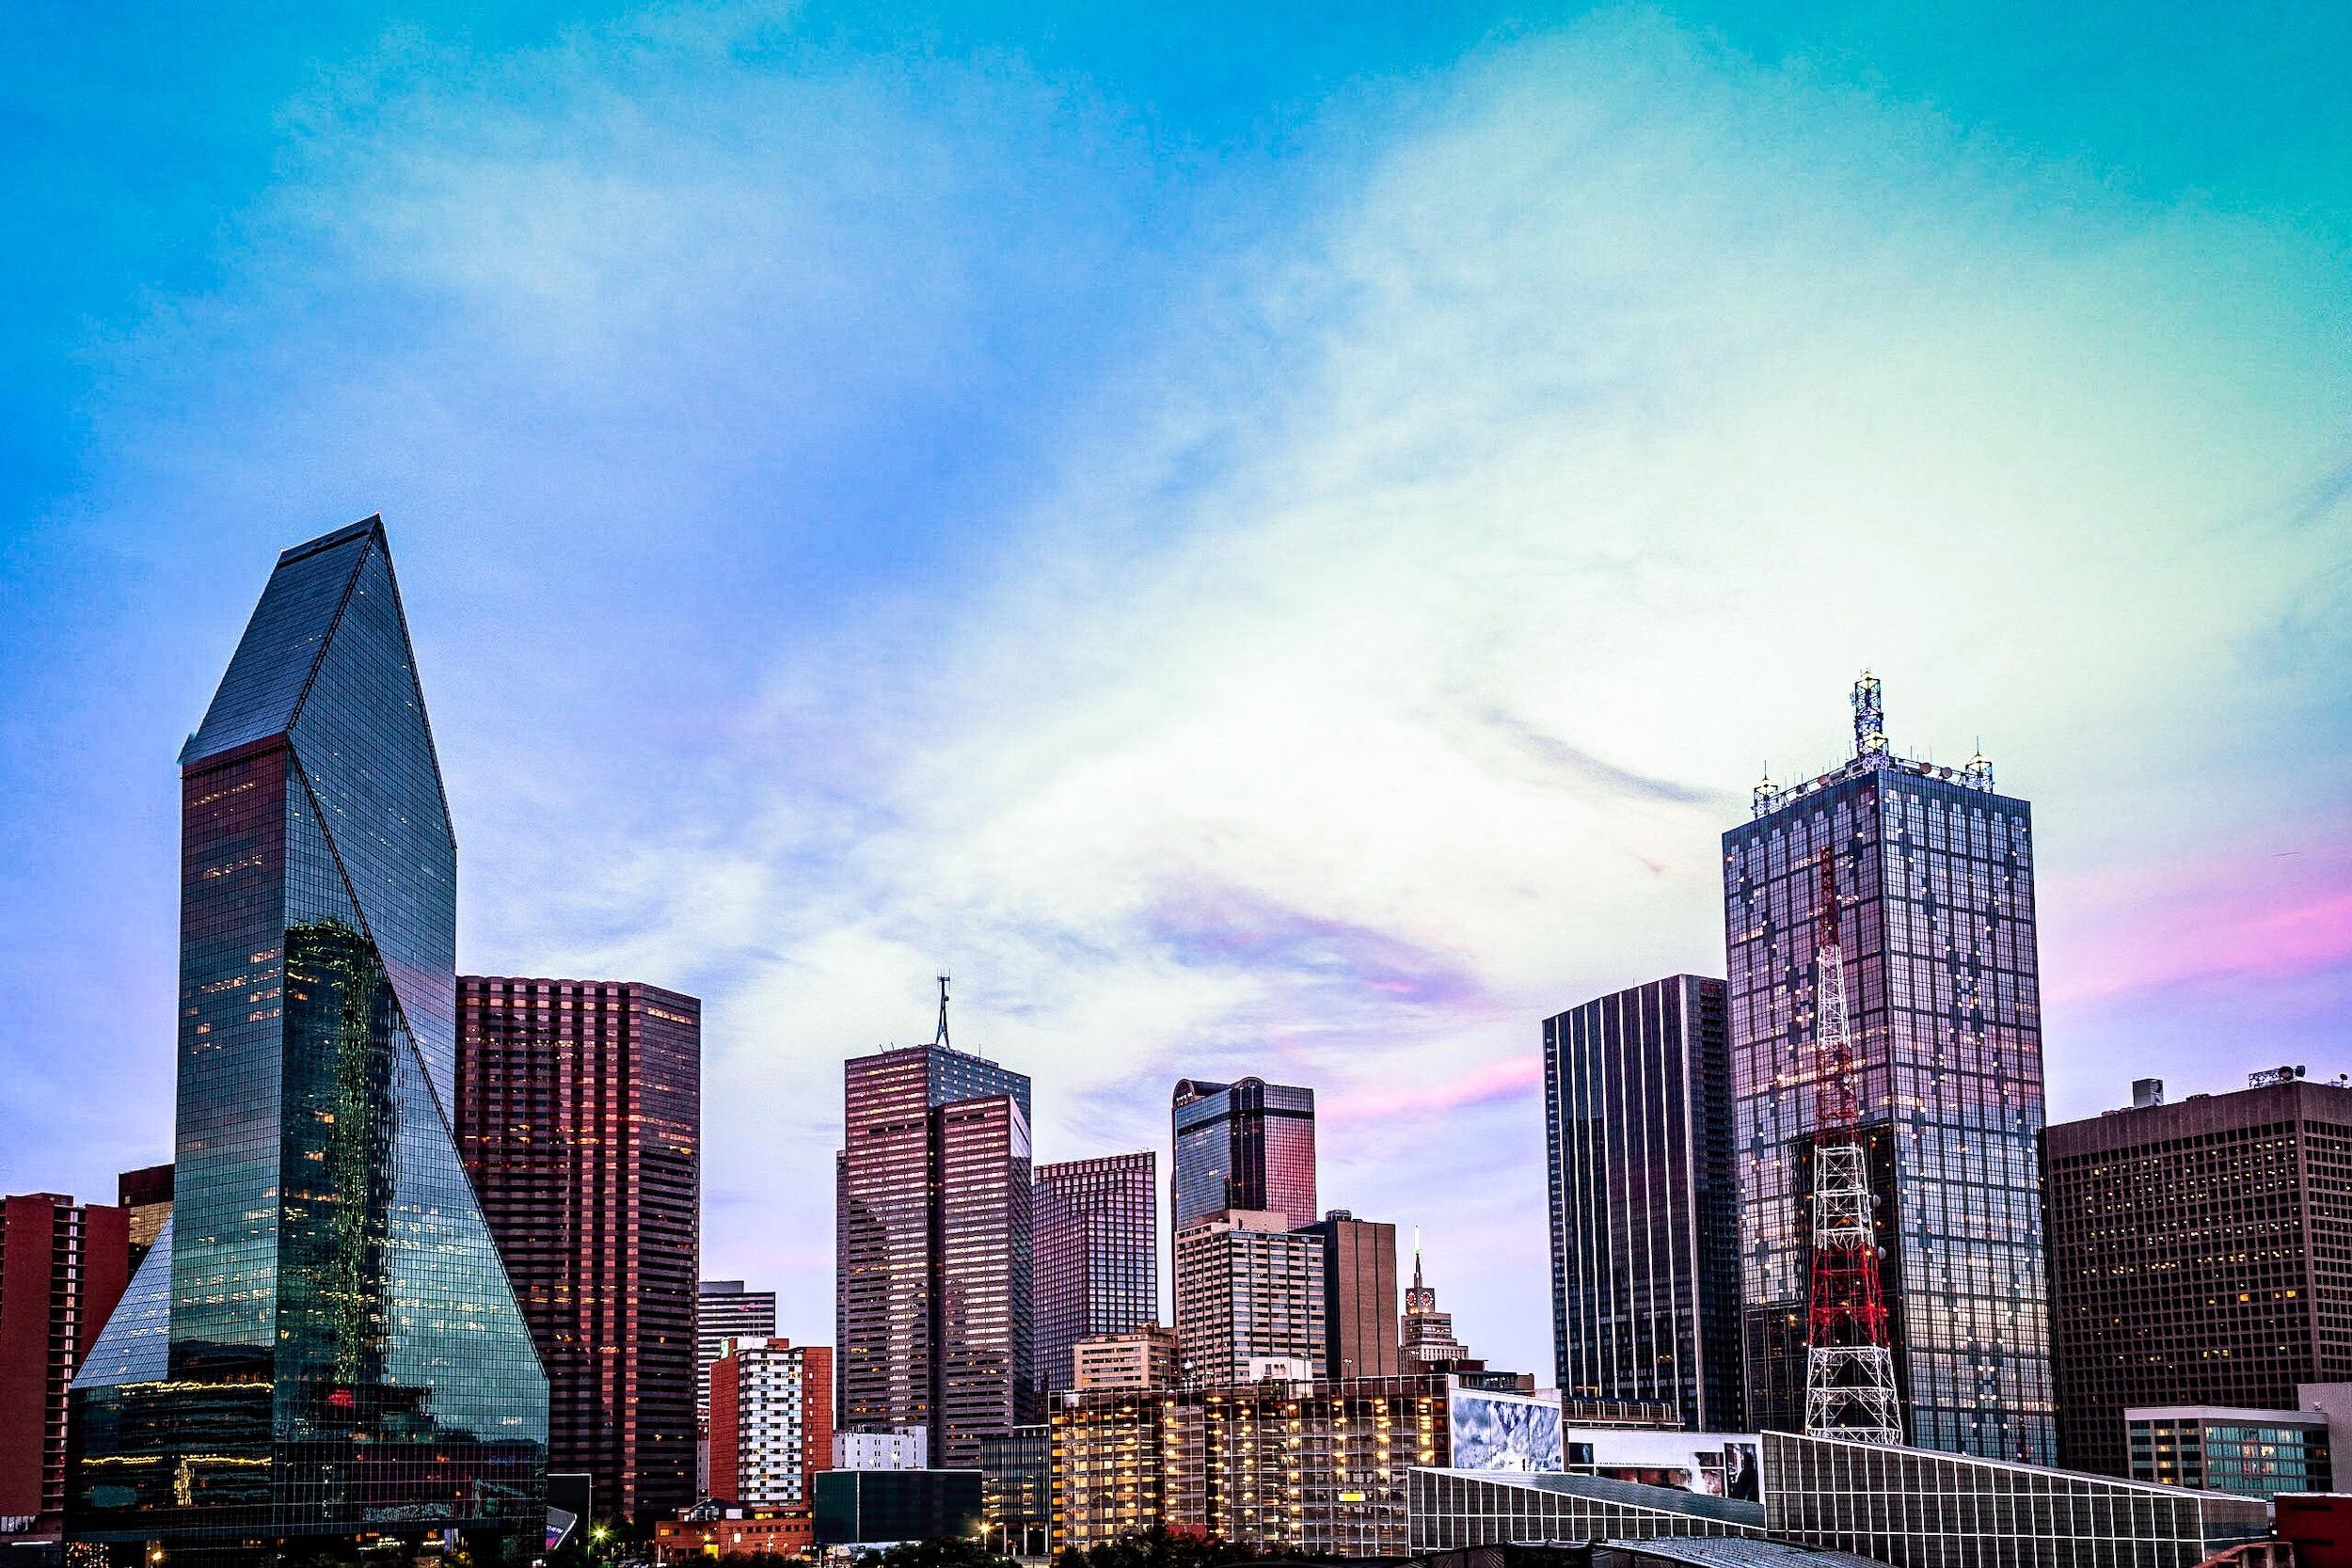 Skyline in Dallas, Texas